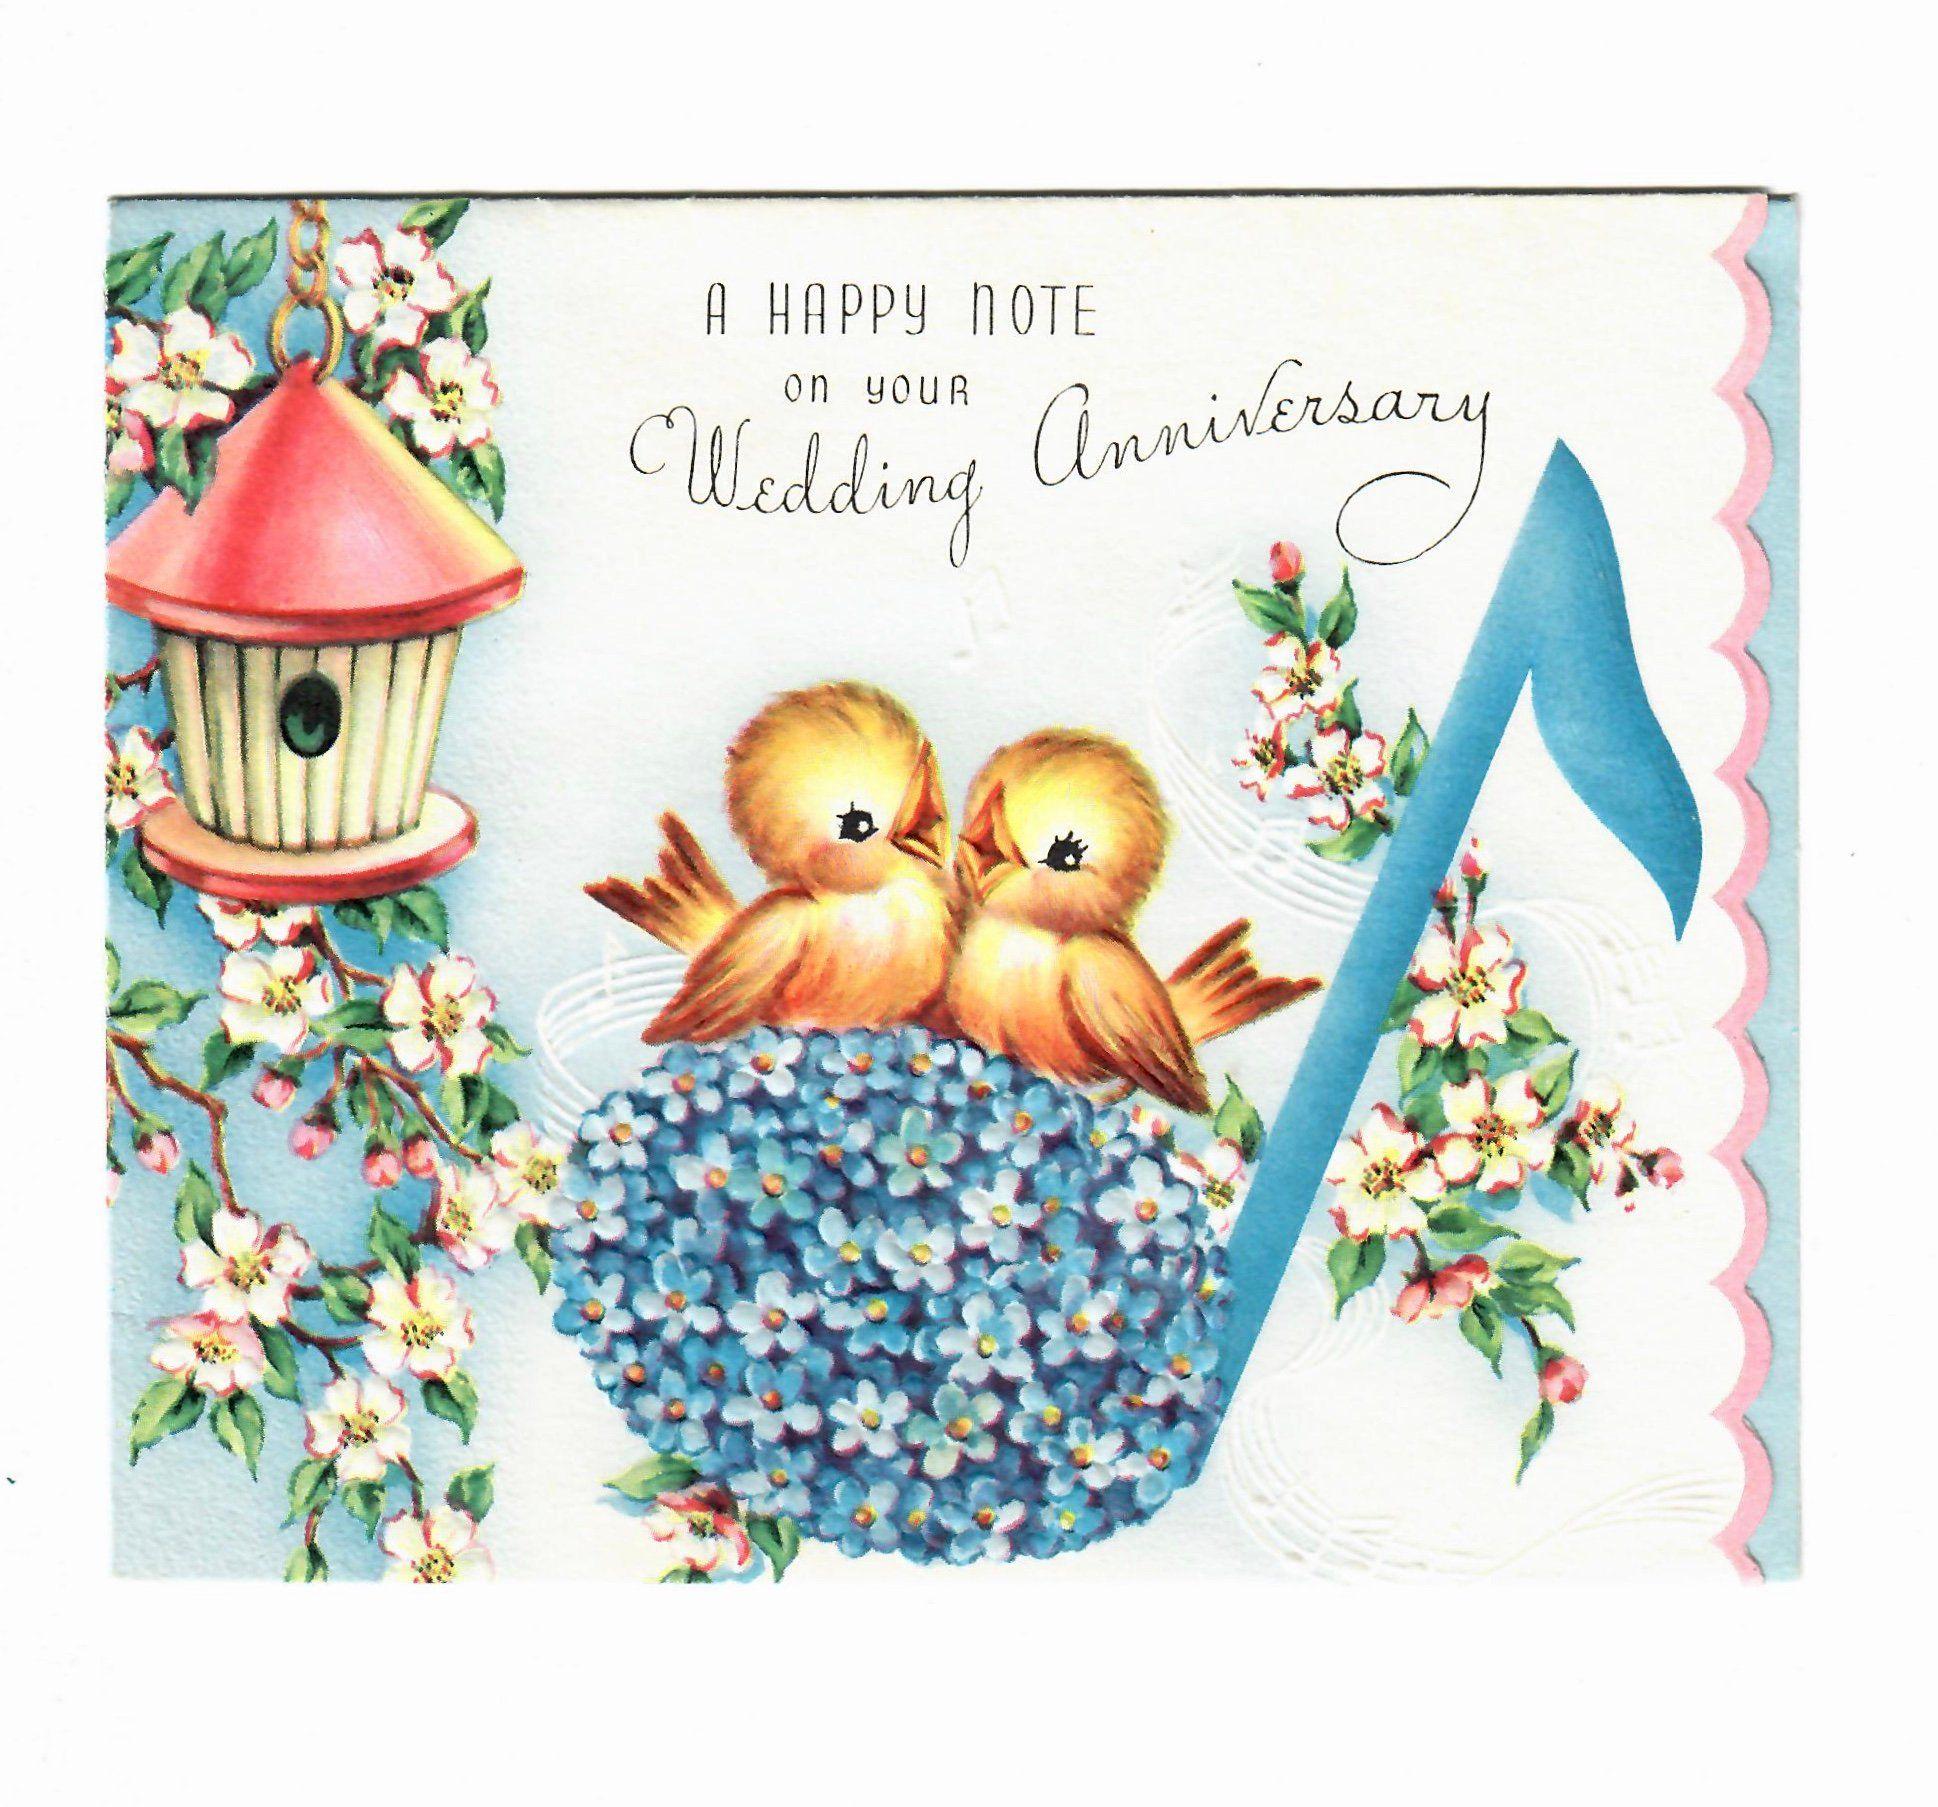 Vintage Unused Wedding Anniversary Greeting Card Happy Wishes Etsy Anniversary Greeting Cards Anniversary Greetings Wedding Anniversary Greeting Cards